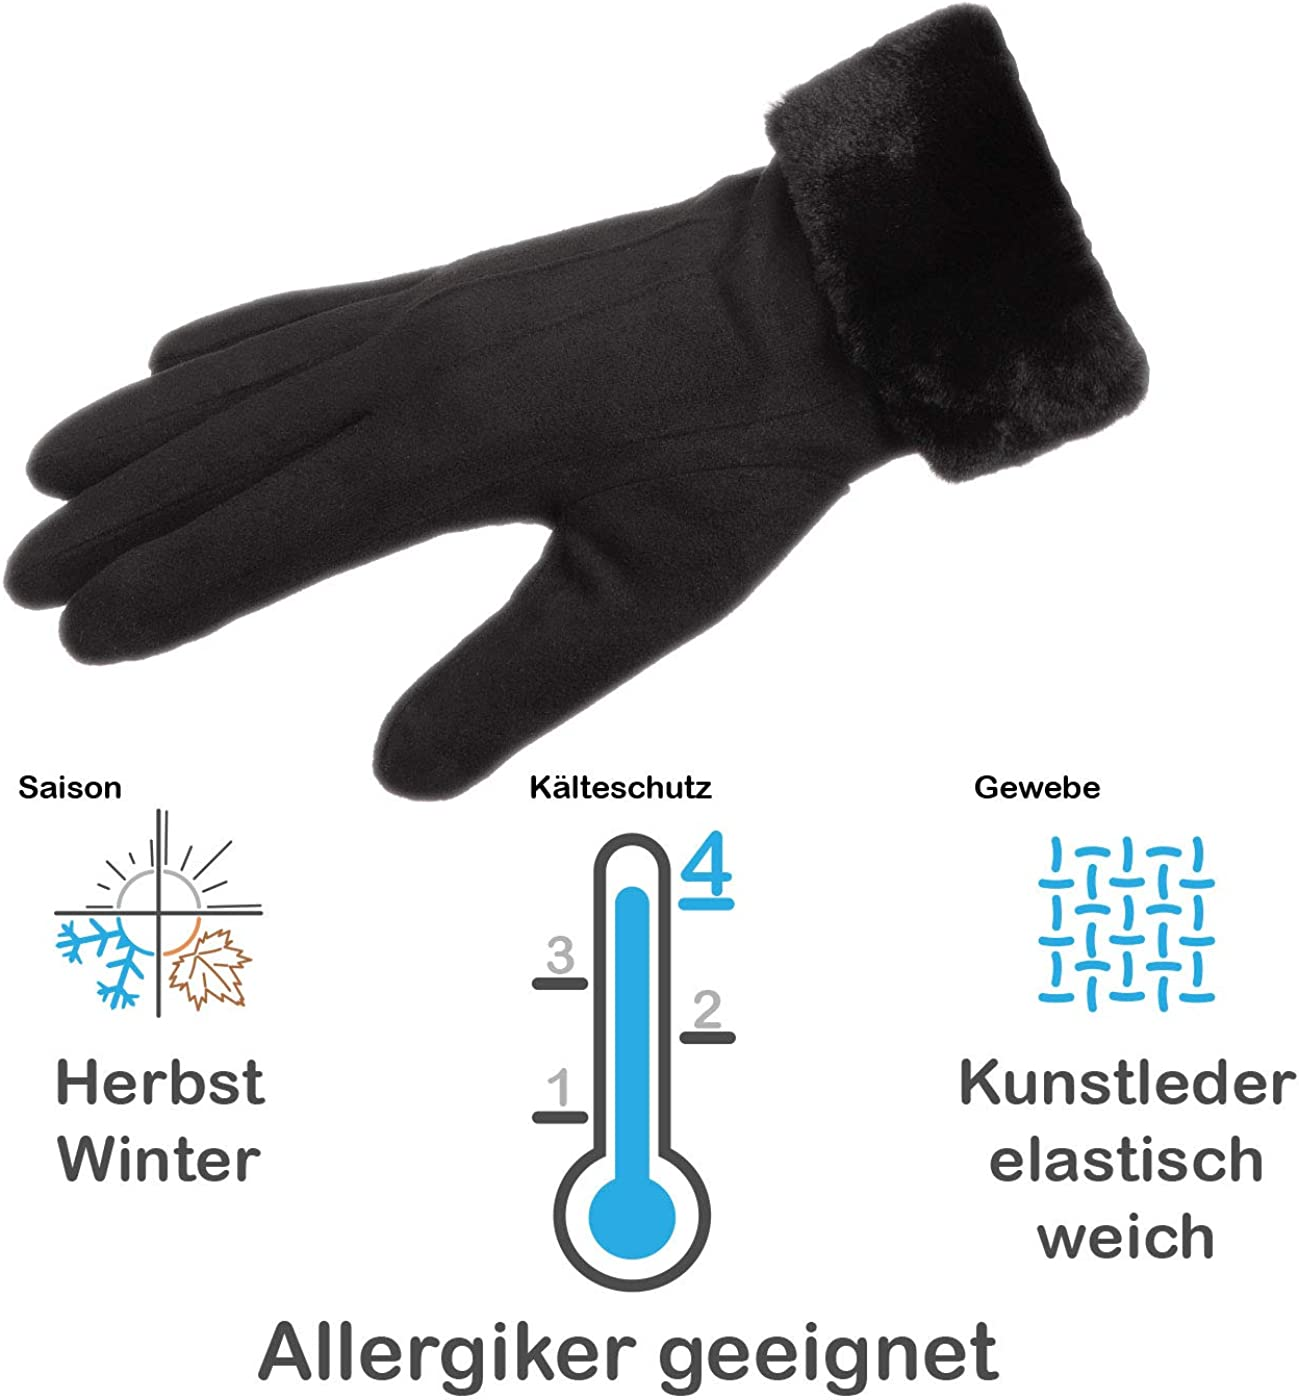 Faera Lederhandschuhe Damen gef/üttert Touchscreen Handschuhe Leder Winterhandschuhe Gloves Onesize